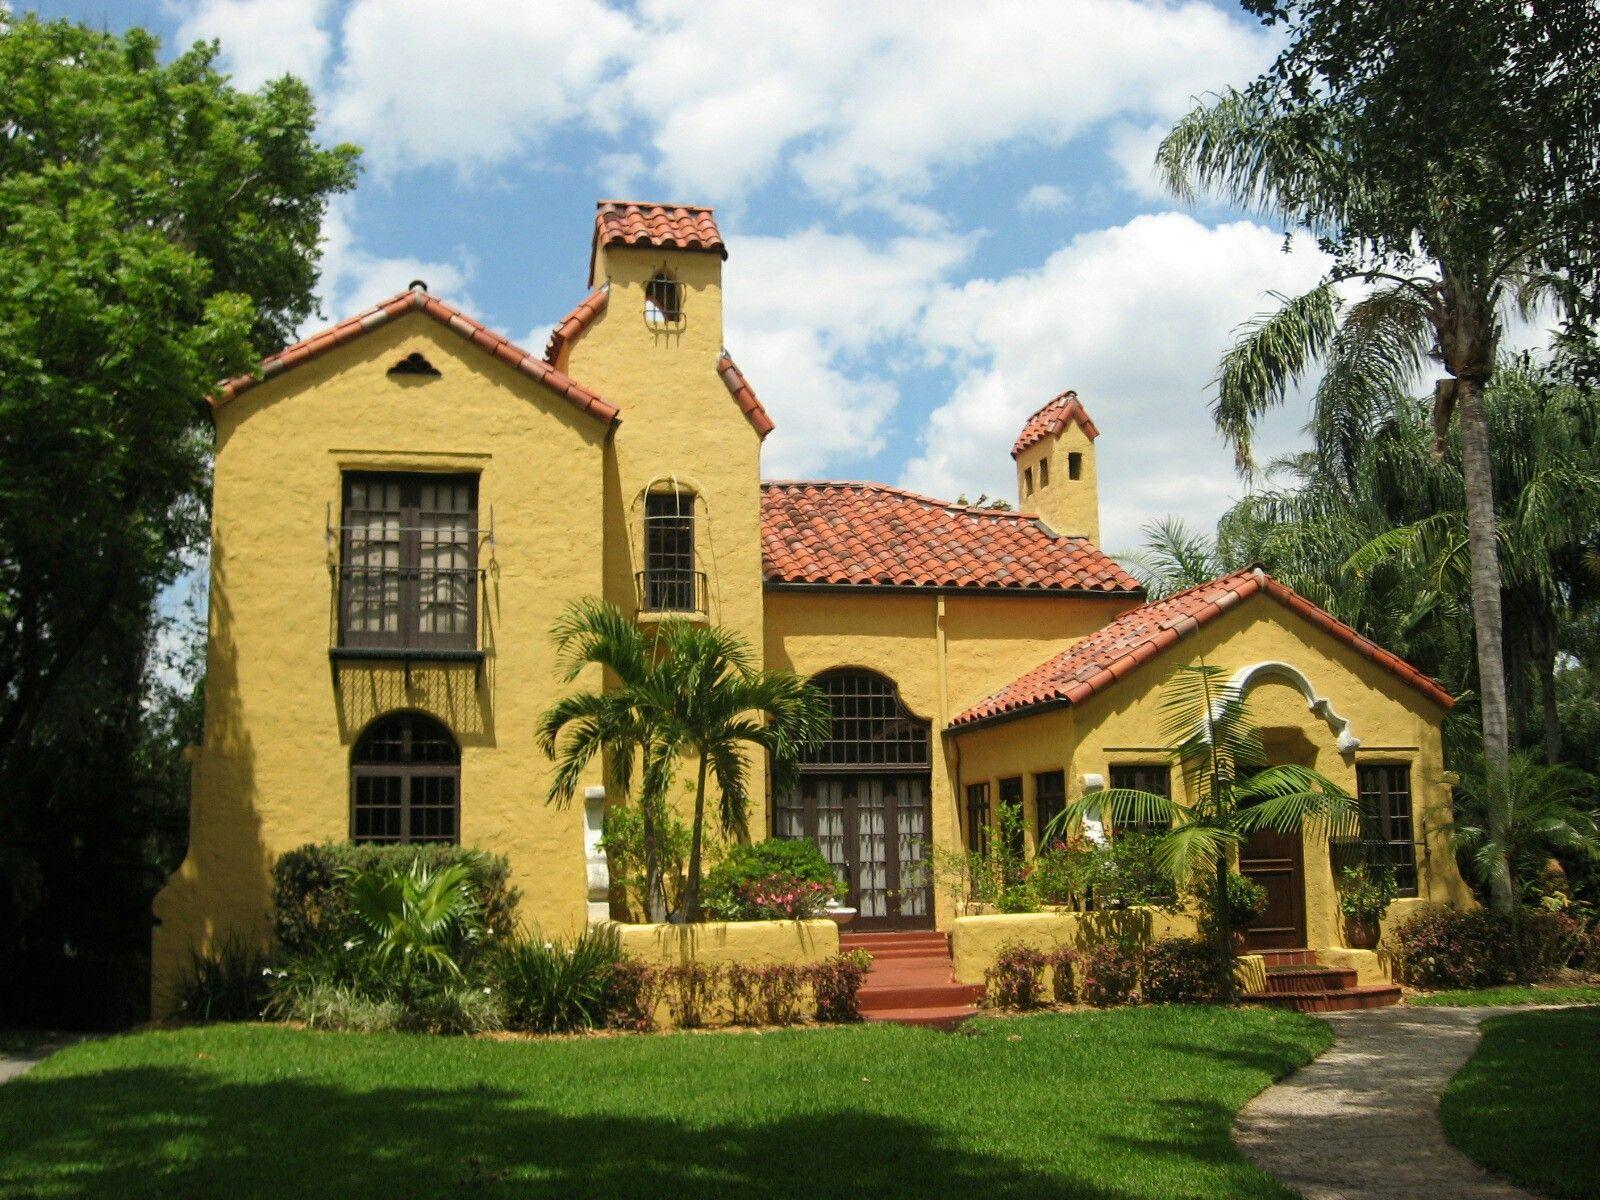 1920 s florida boom time home mediterranean revival trivial rh pinterest com